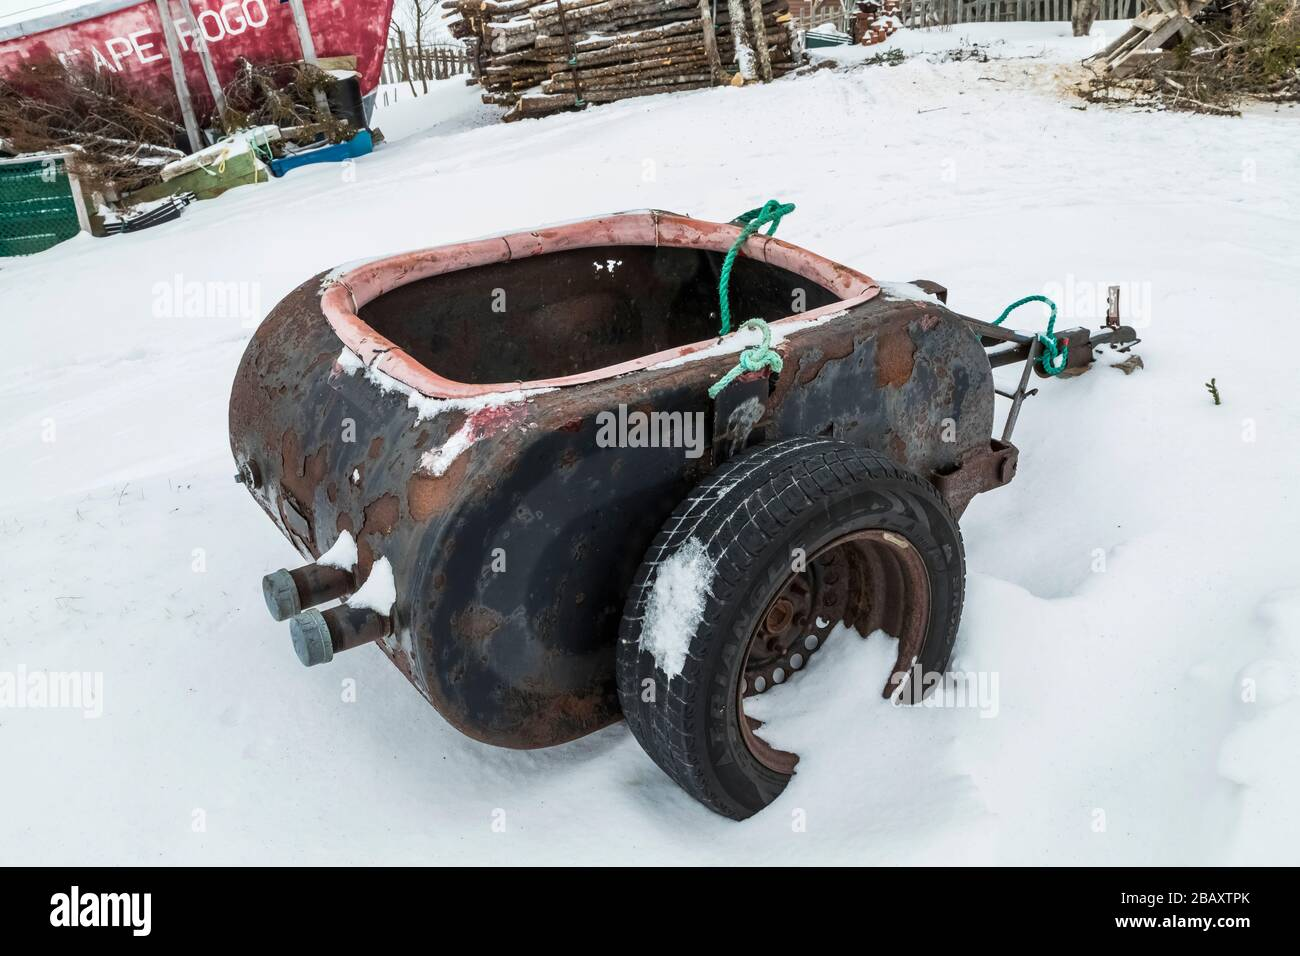 Cliver oil tank trailer for ATV or Ski-Doo at the home of Desmond Adams in Joe Batt's Arm on Fogo Island, Newfoundland, Canada [No property release; a Stock Photo